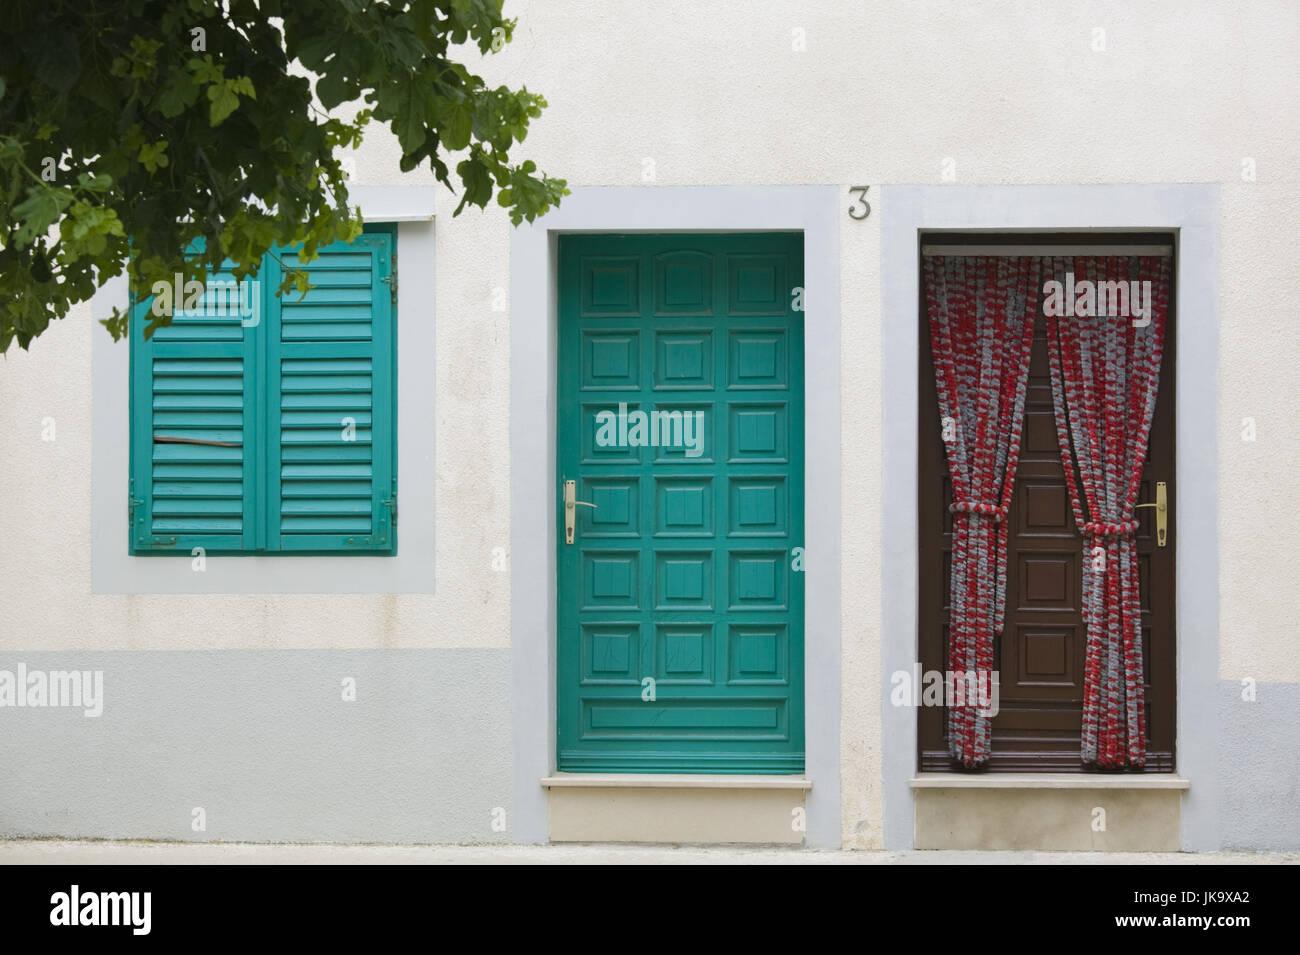 Kroatien, Zadar-Region, Insel Pag, Stadt Pag, Hausfassade, Detail, - Stock Image